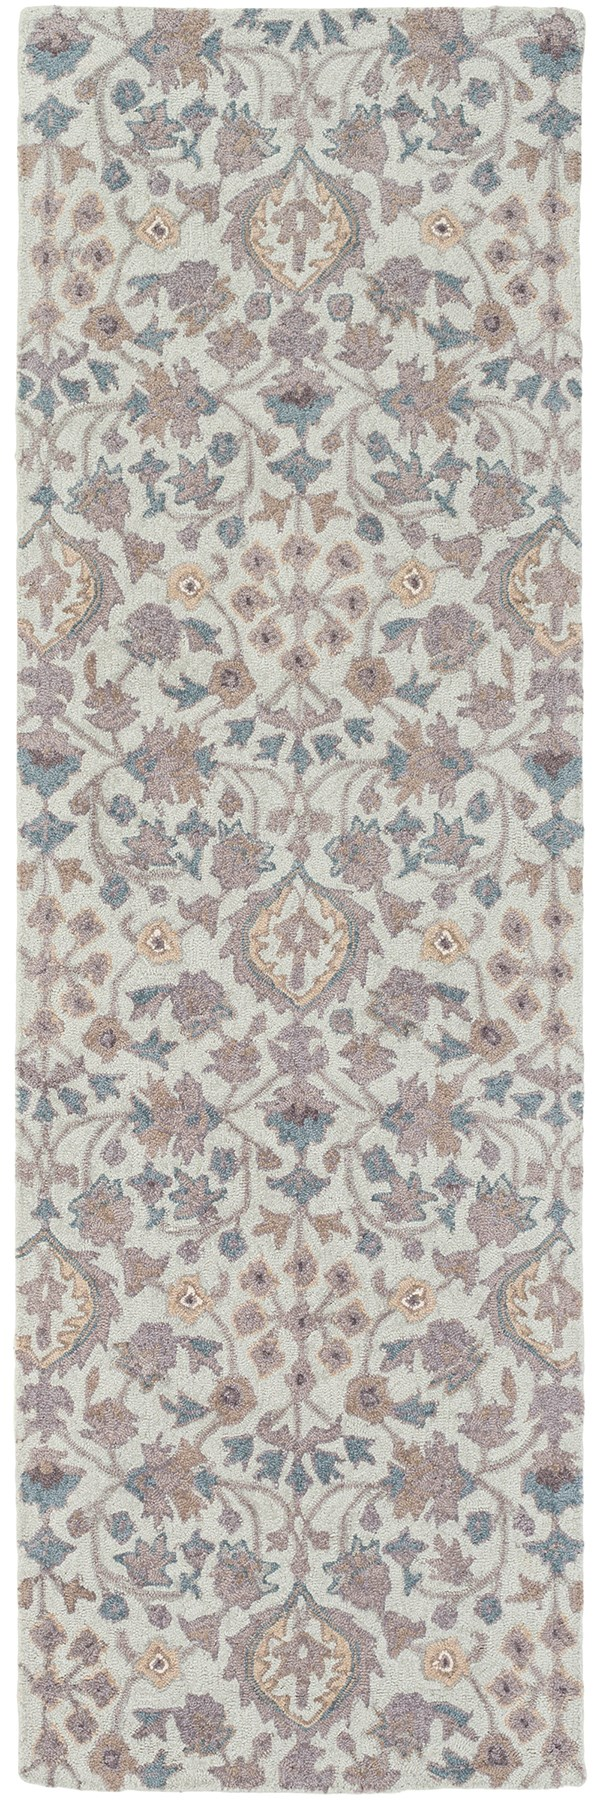 Medium Gray, Dark Blue, Light Gray, Taupe Traditional / Oriental Area Rug